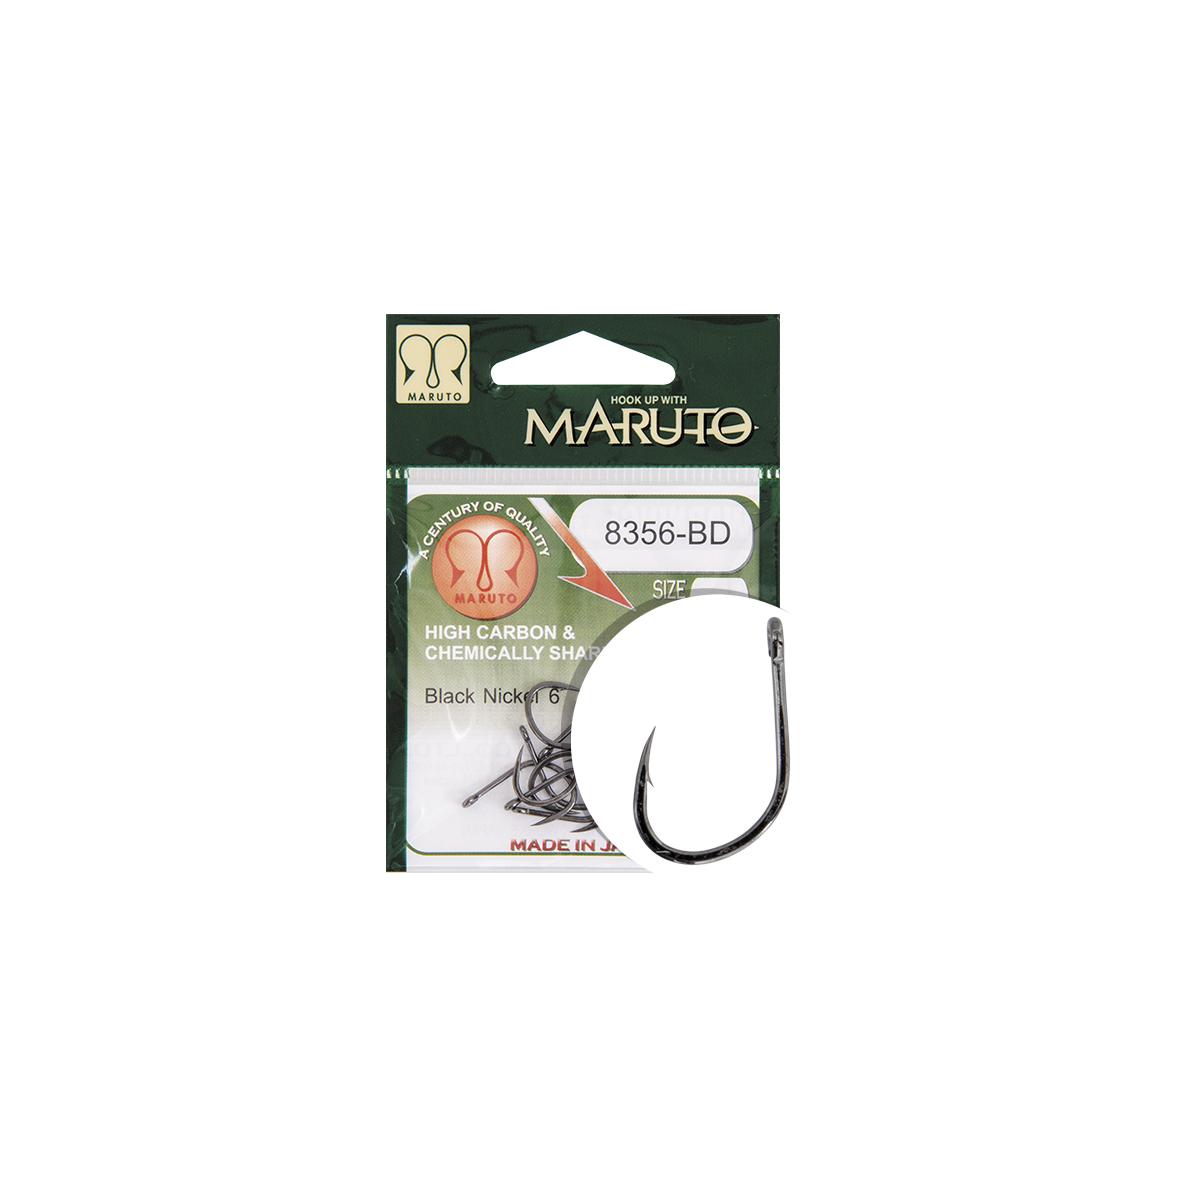 CARLIGE MARUTO 8356-BD CARP HOOKS BARBED FORGED STRAIGHT E - 43205004